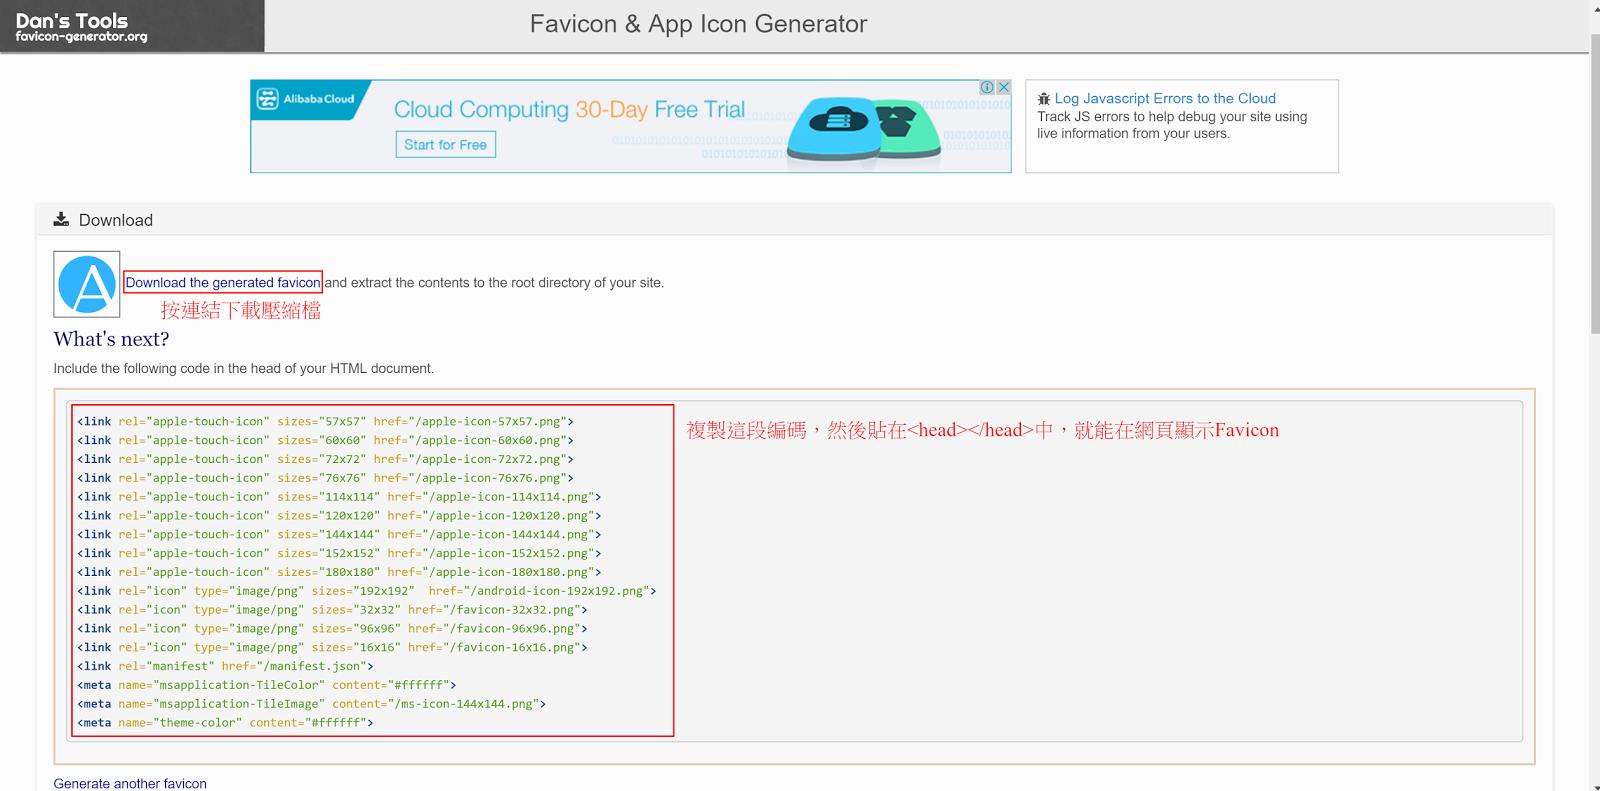 除了能下載Icons,還附上一段HTML編碼